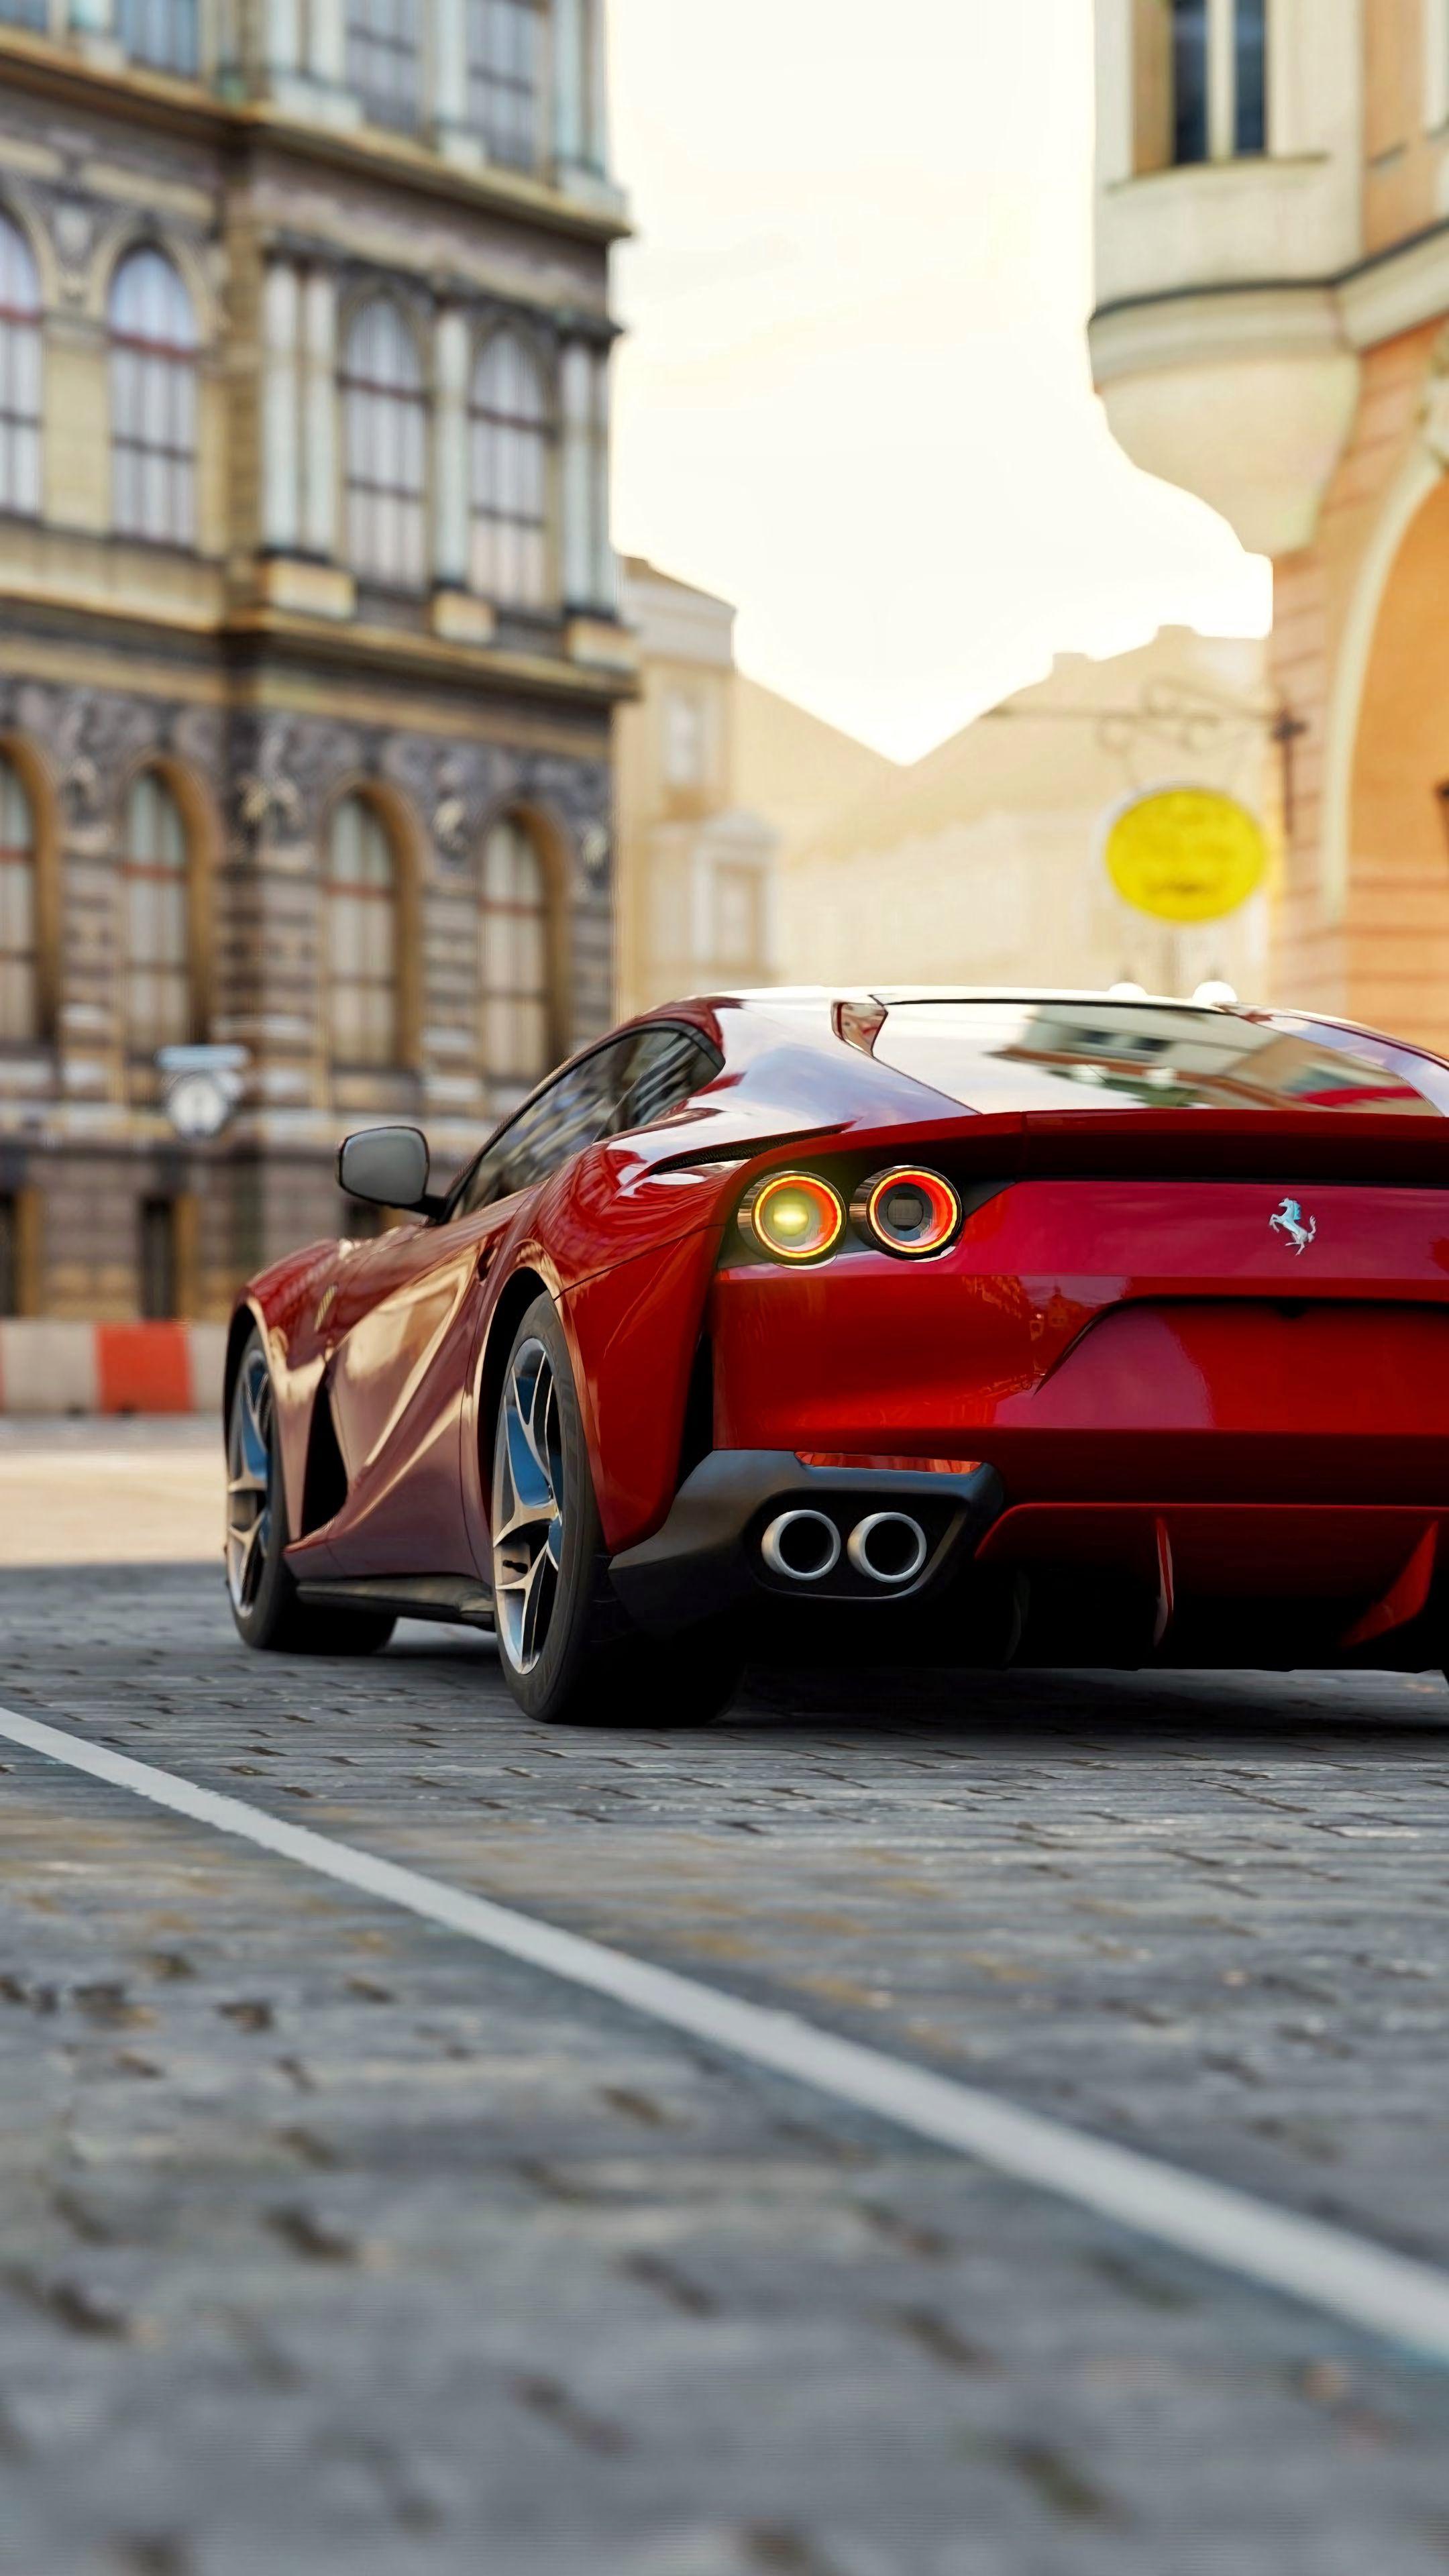 111860 download wallpaper Ferrari, Sports, Cars, Sports Car, Ferrari 812 Superfast, Ferrari 812 screensavers and pictures for free